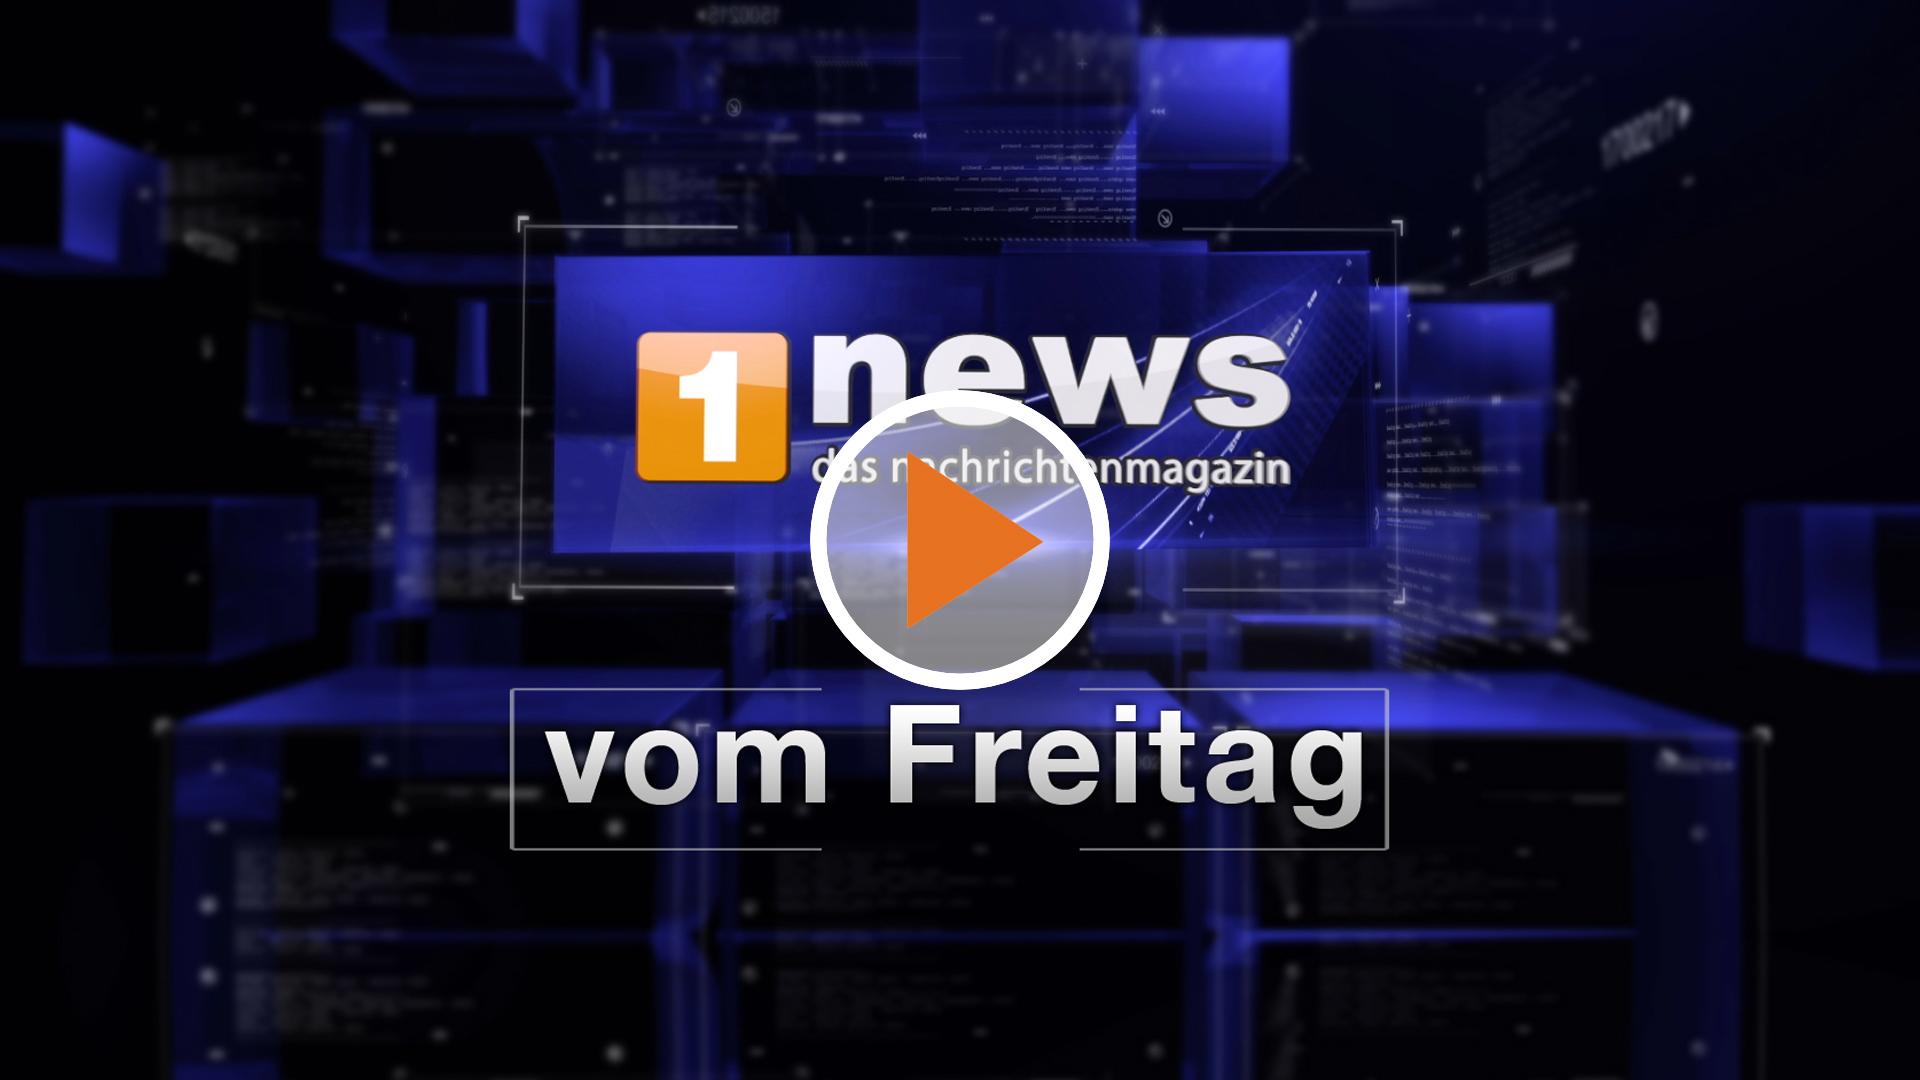 Screen_1news FreitagNEU